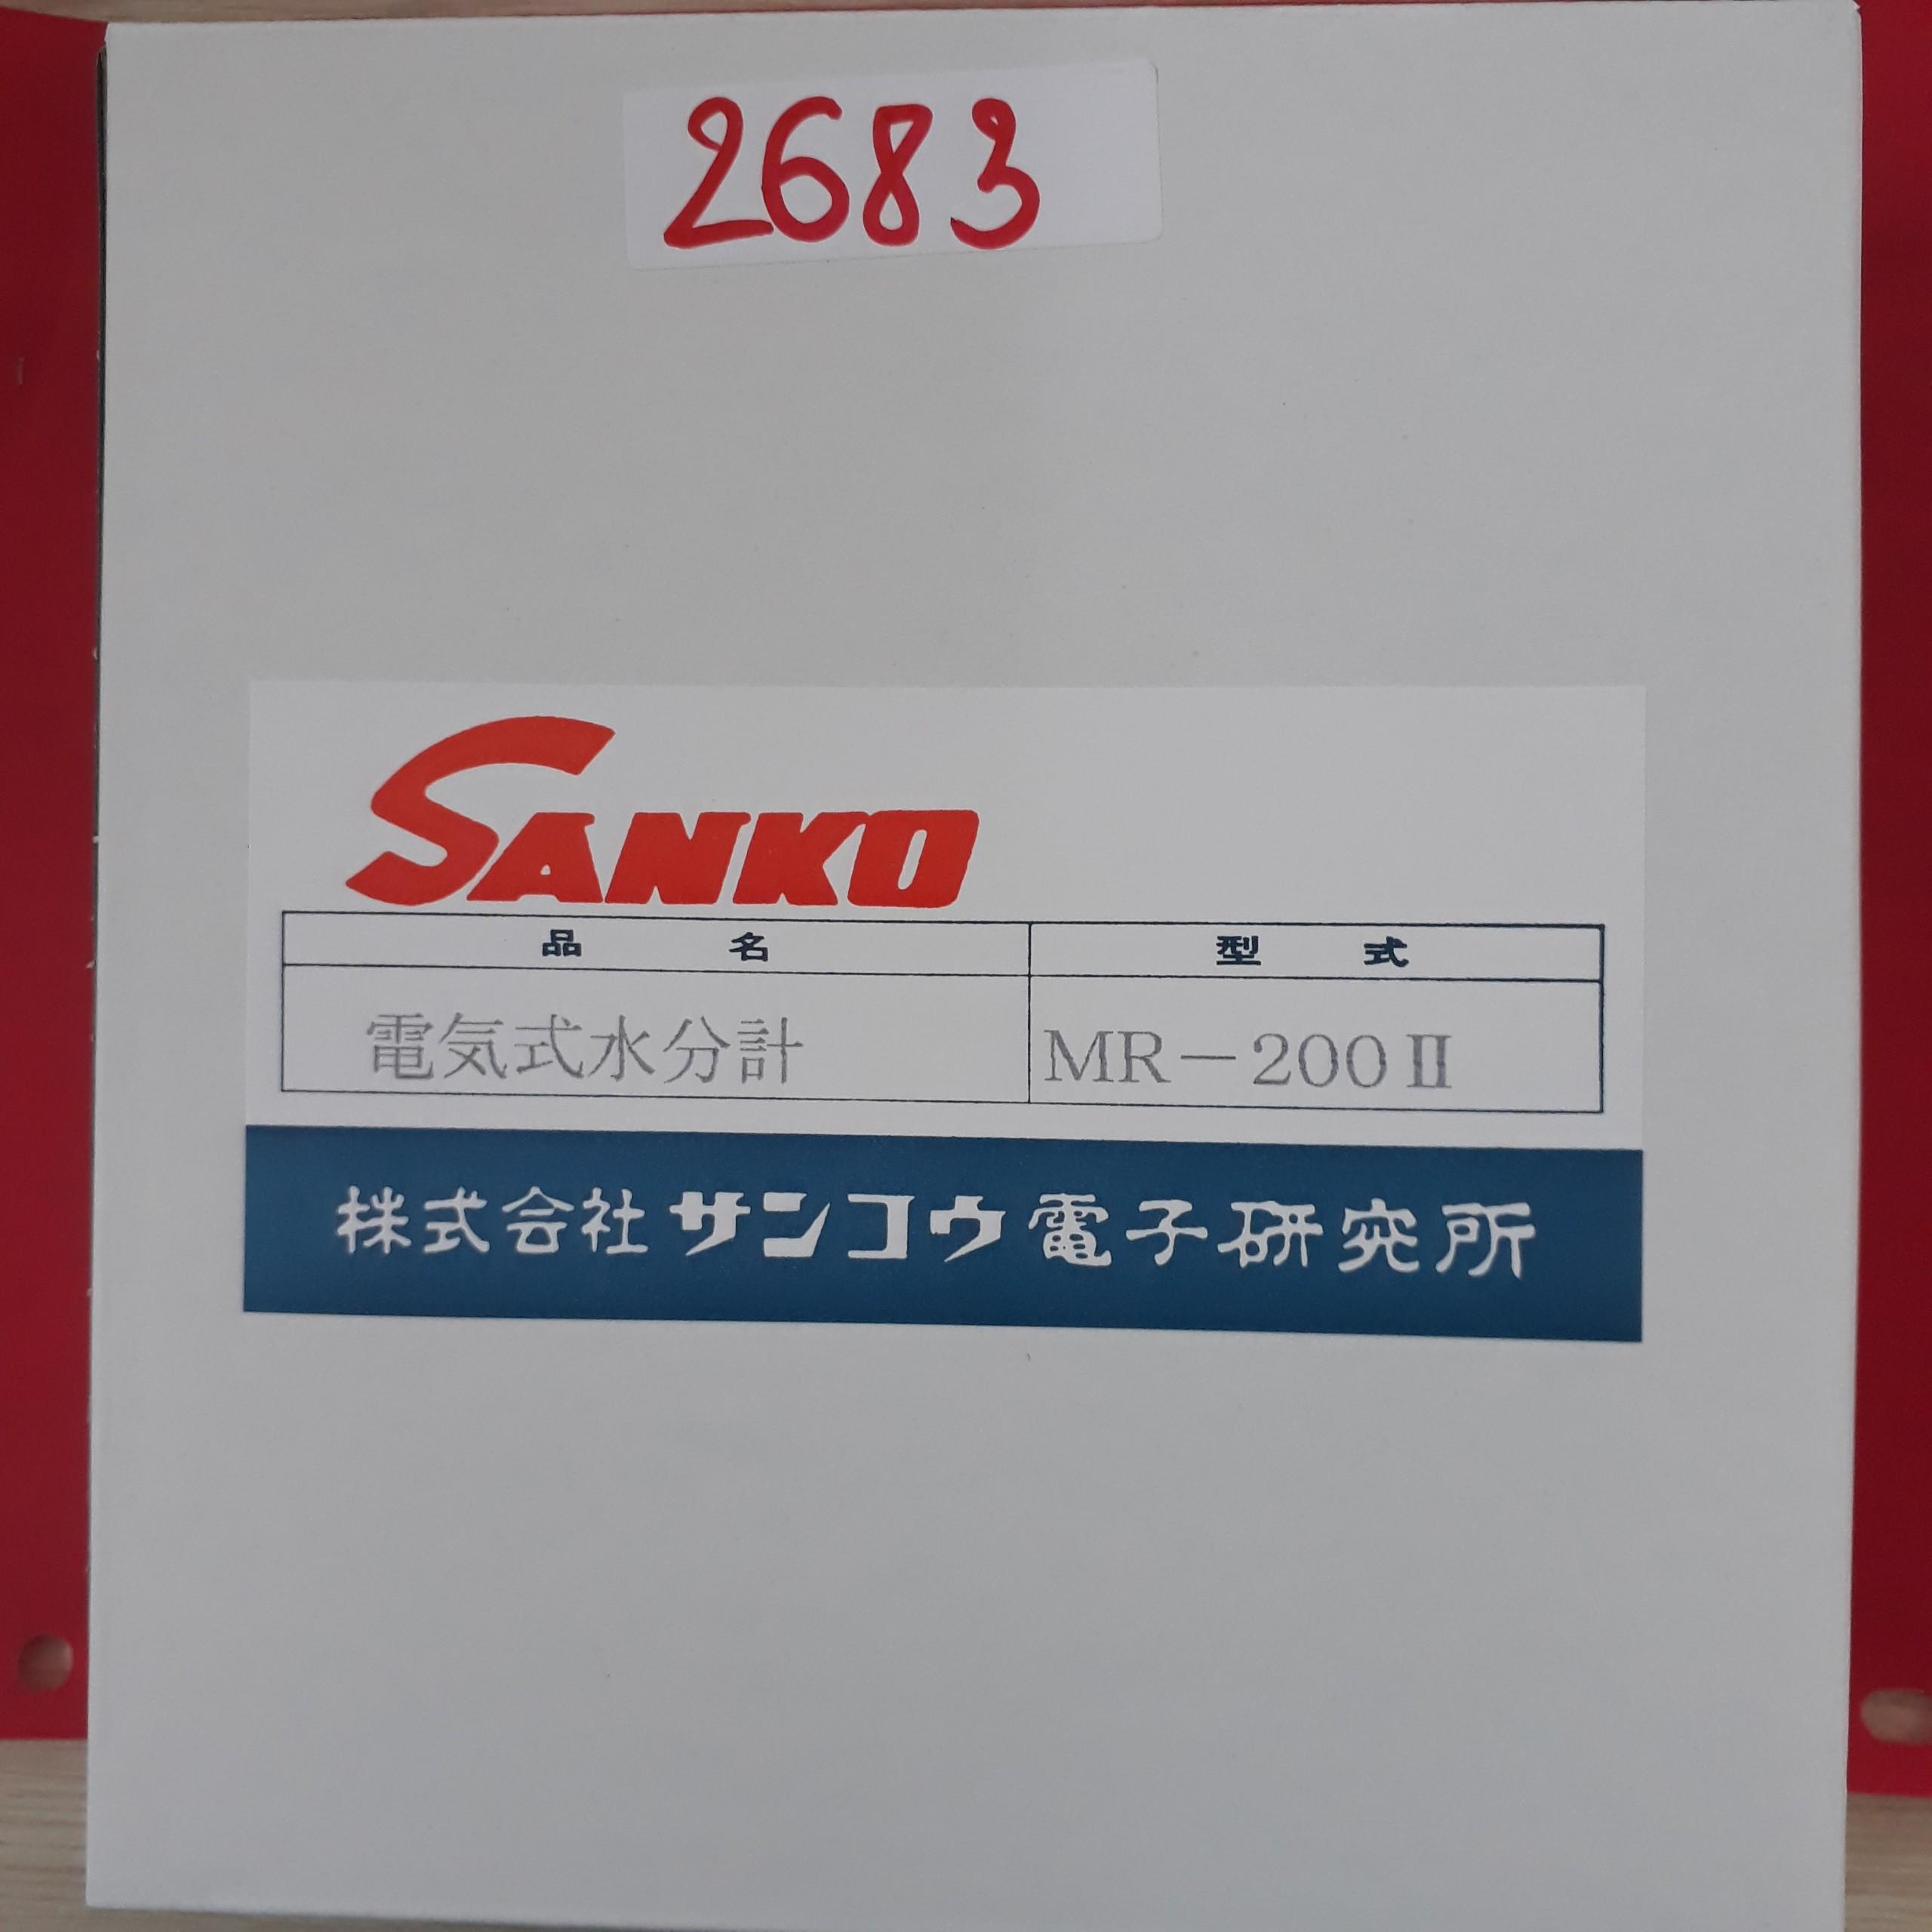 Máy đo độ ẩm moisture Meter MR-200Ⅱ sanko